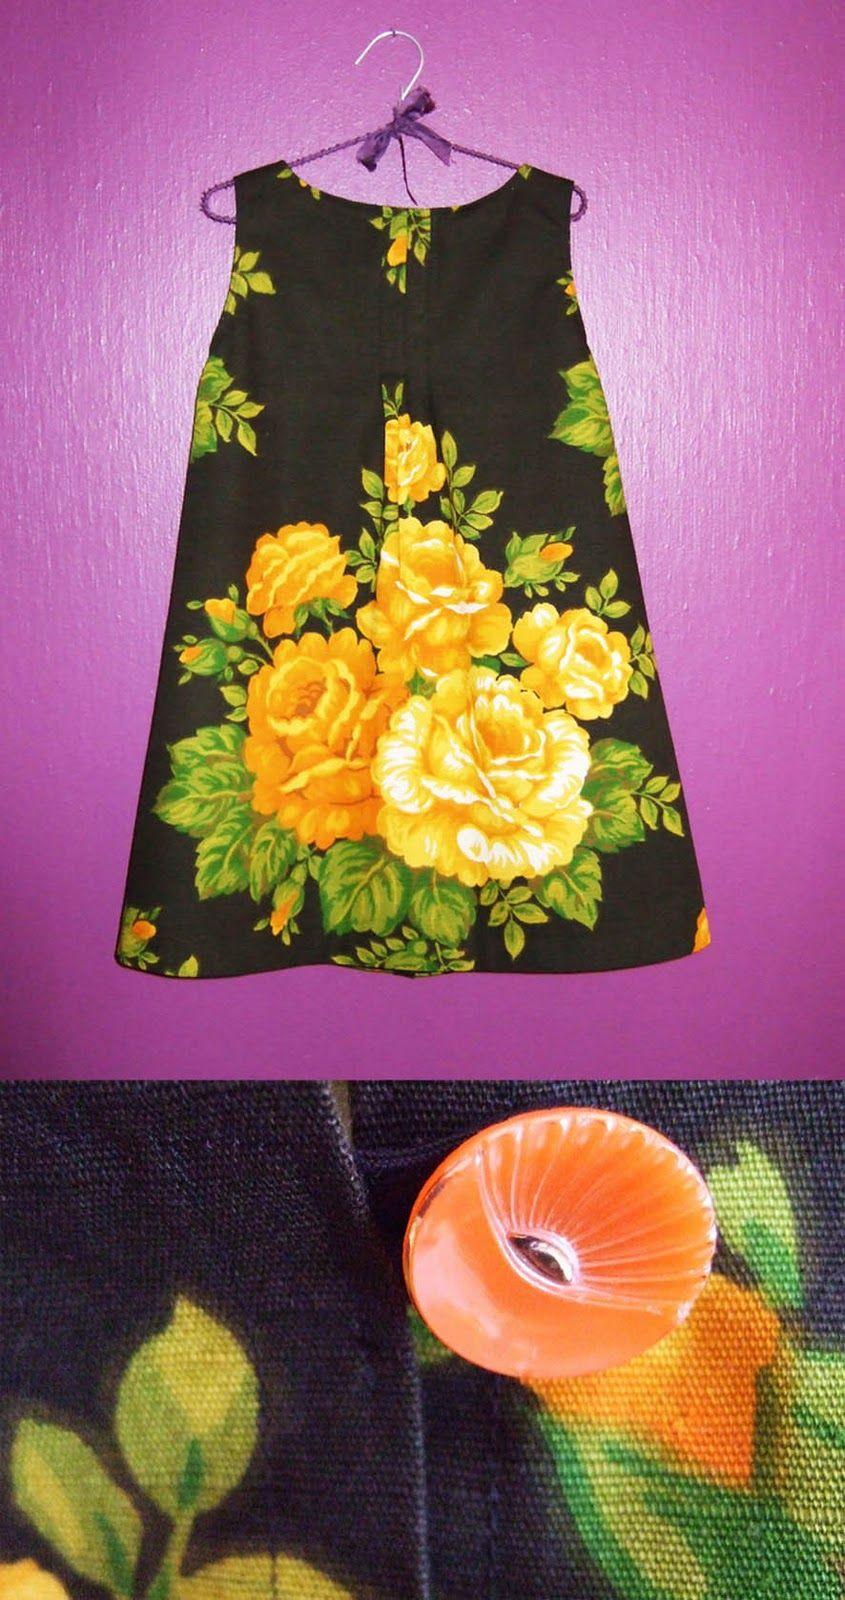 Cecilie-design: Nytt år i ny kjole - a new dress for the new year